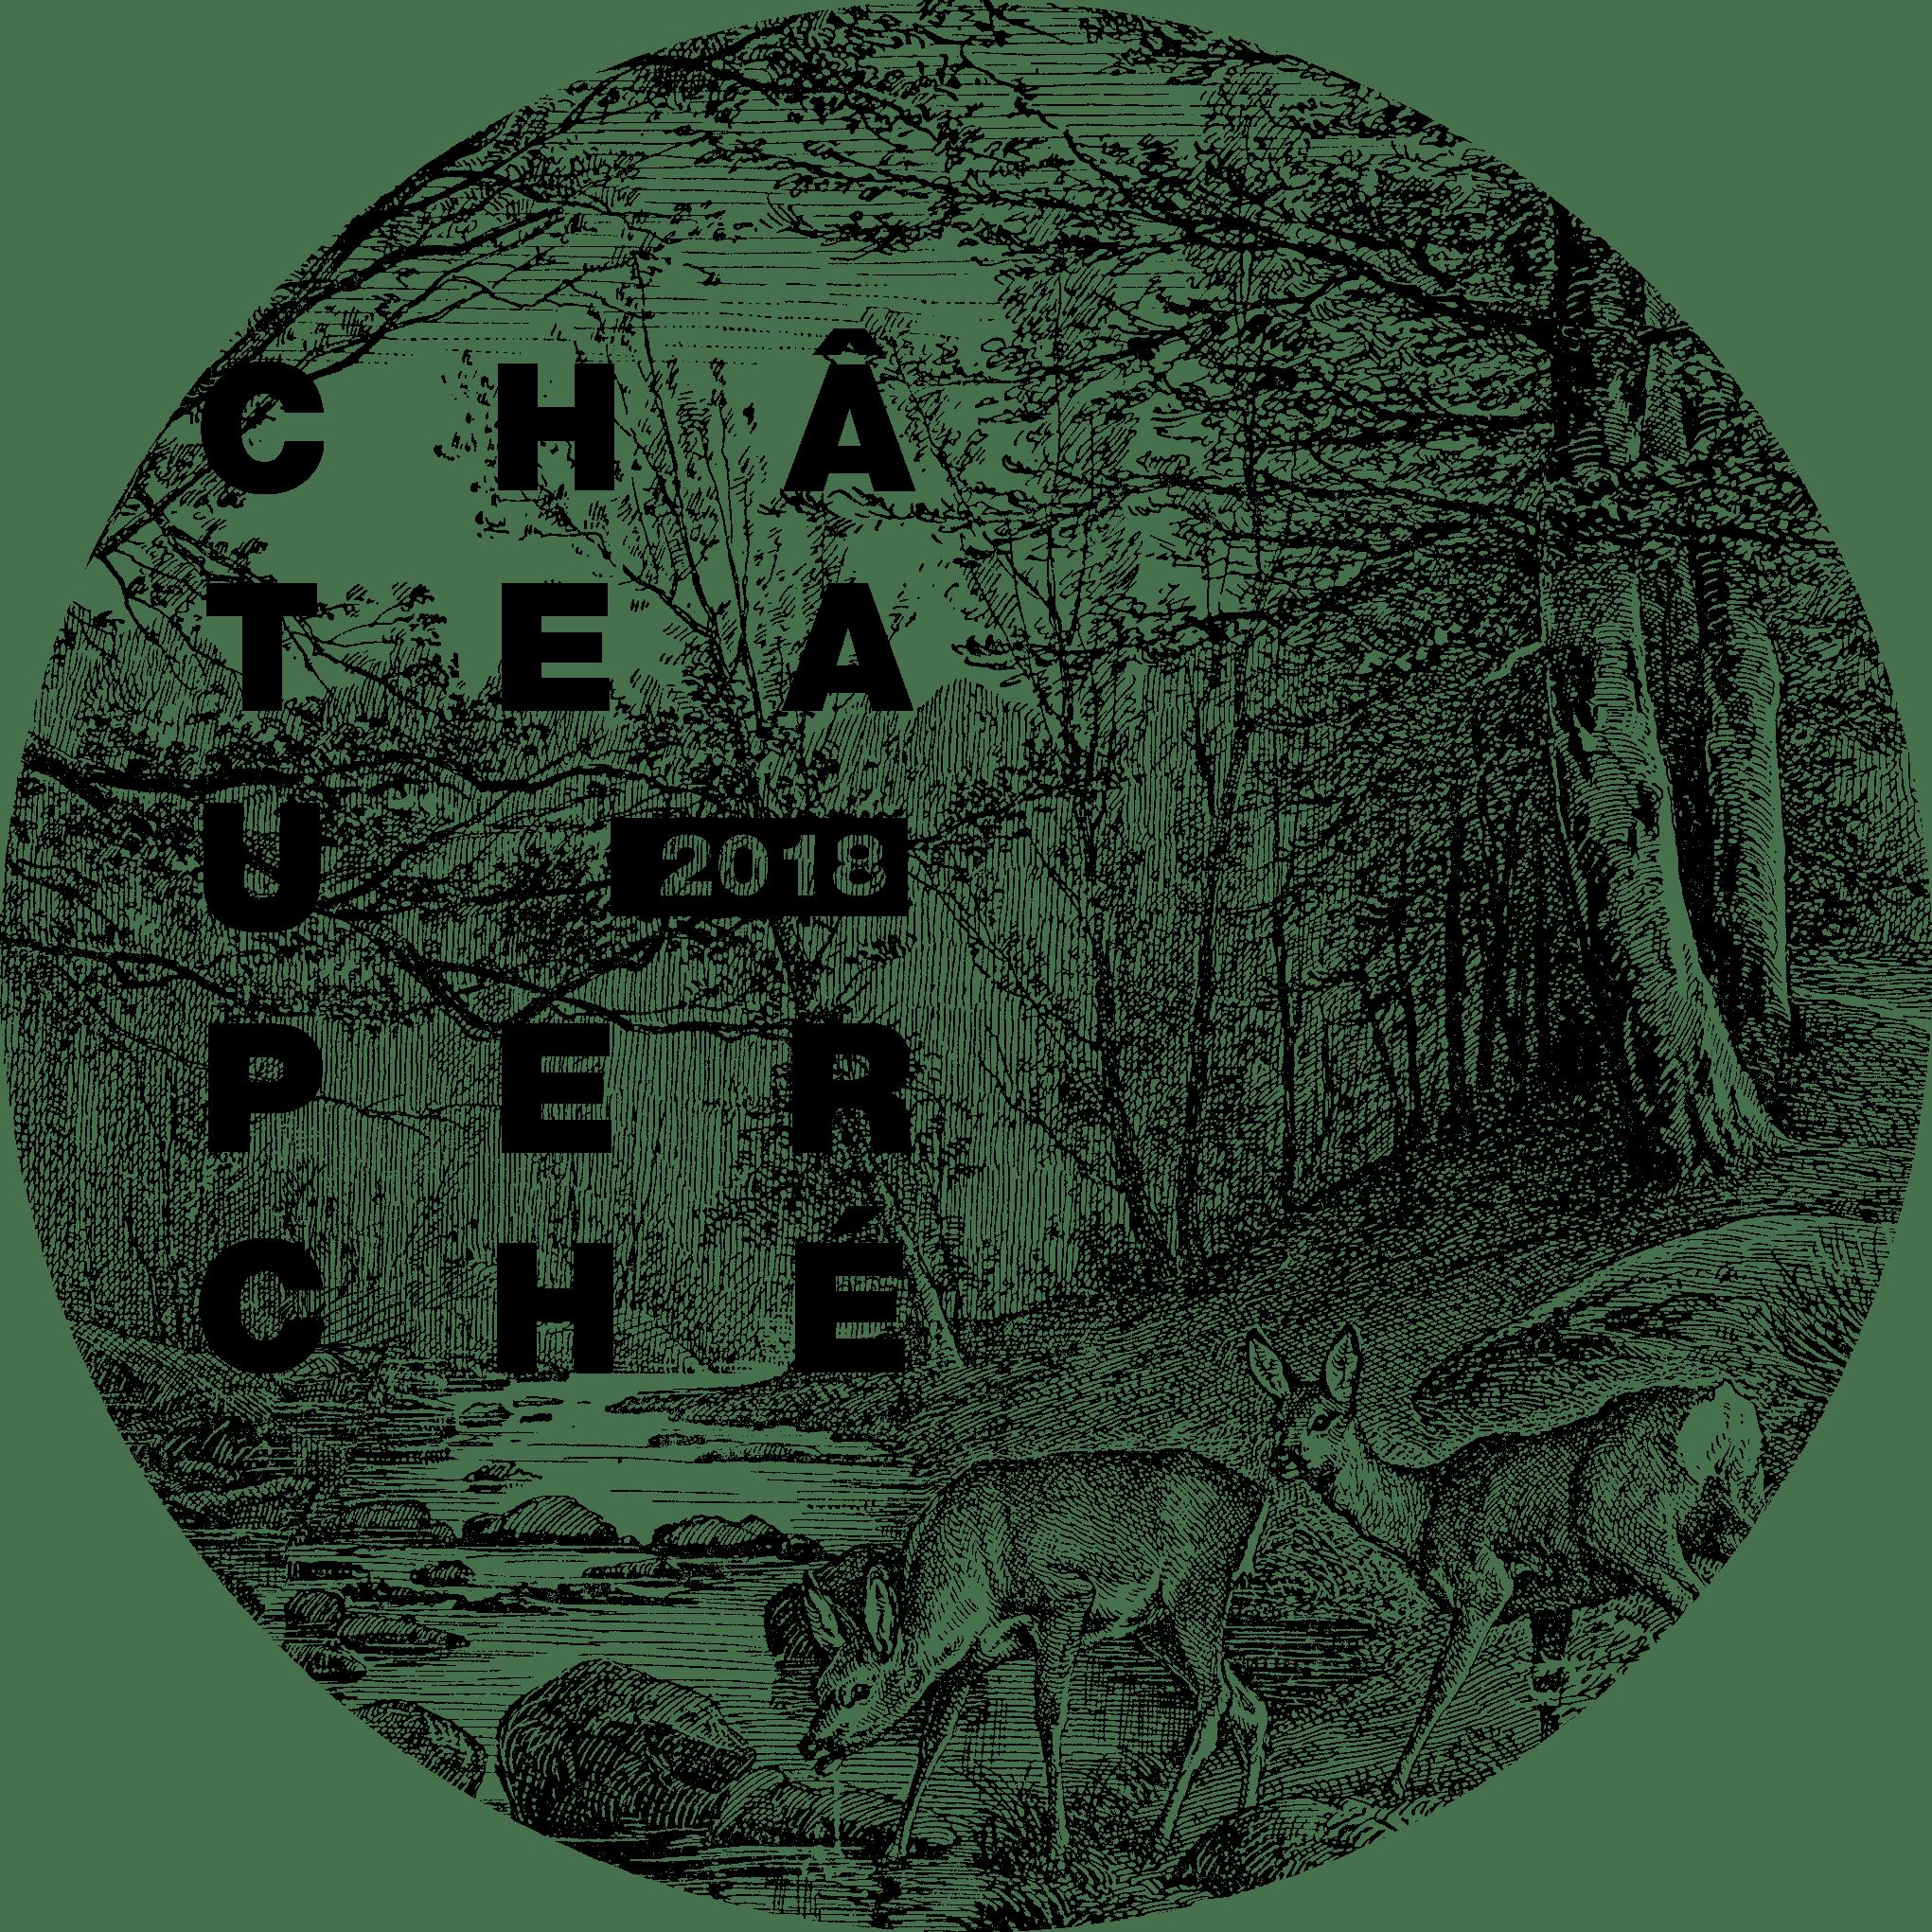 Château Perché 2018